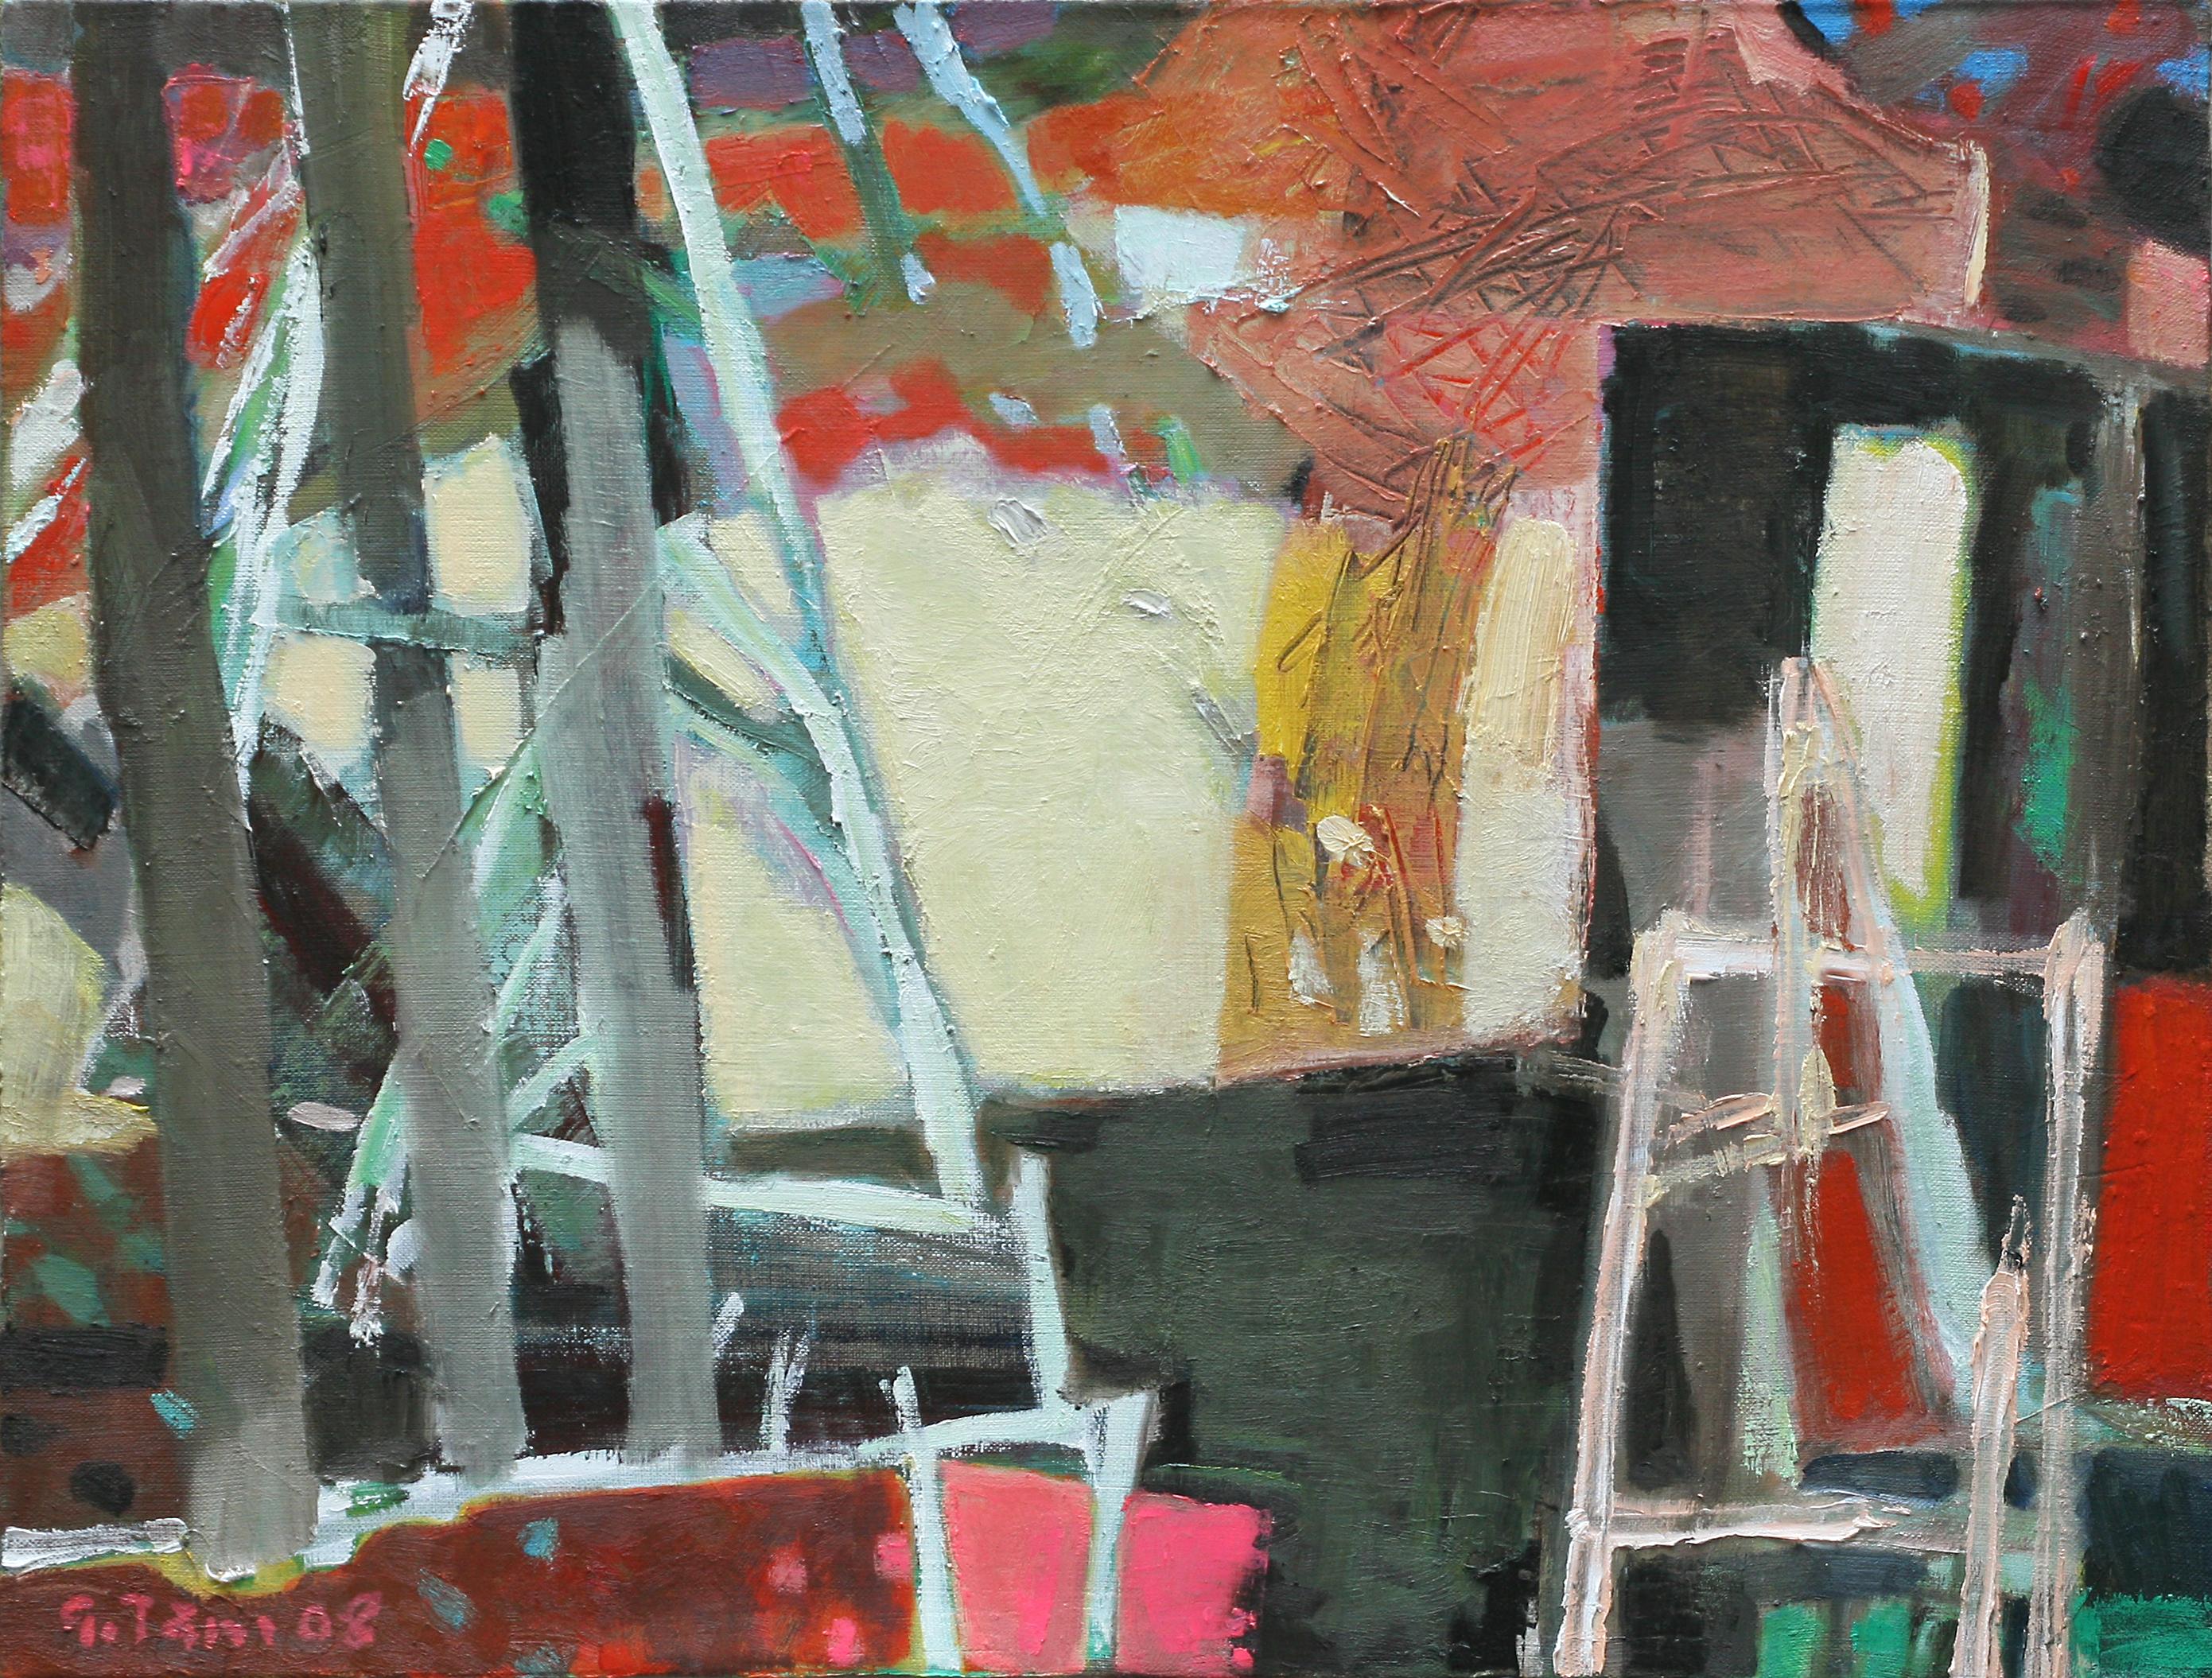 Painting Lanscape | Vẽ Phong Cảnh